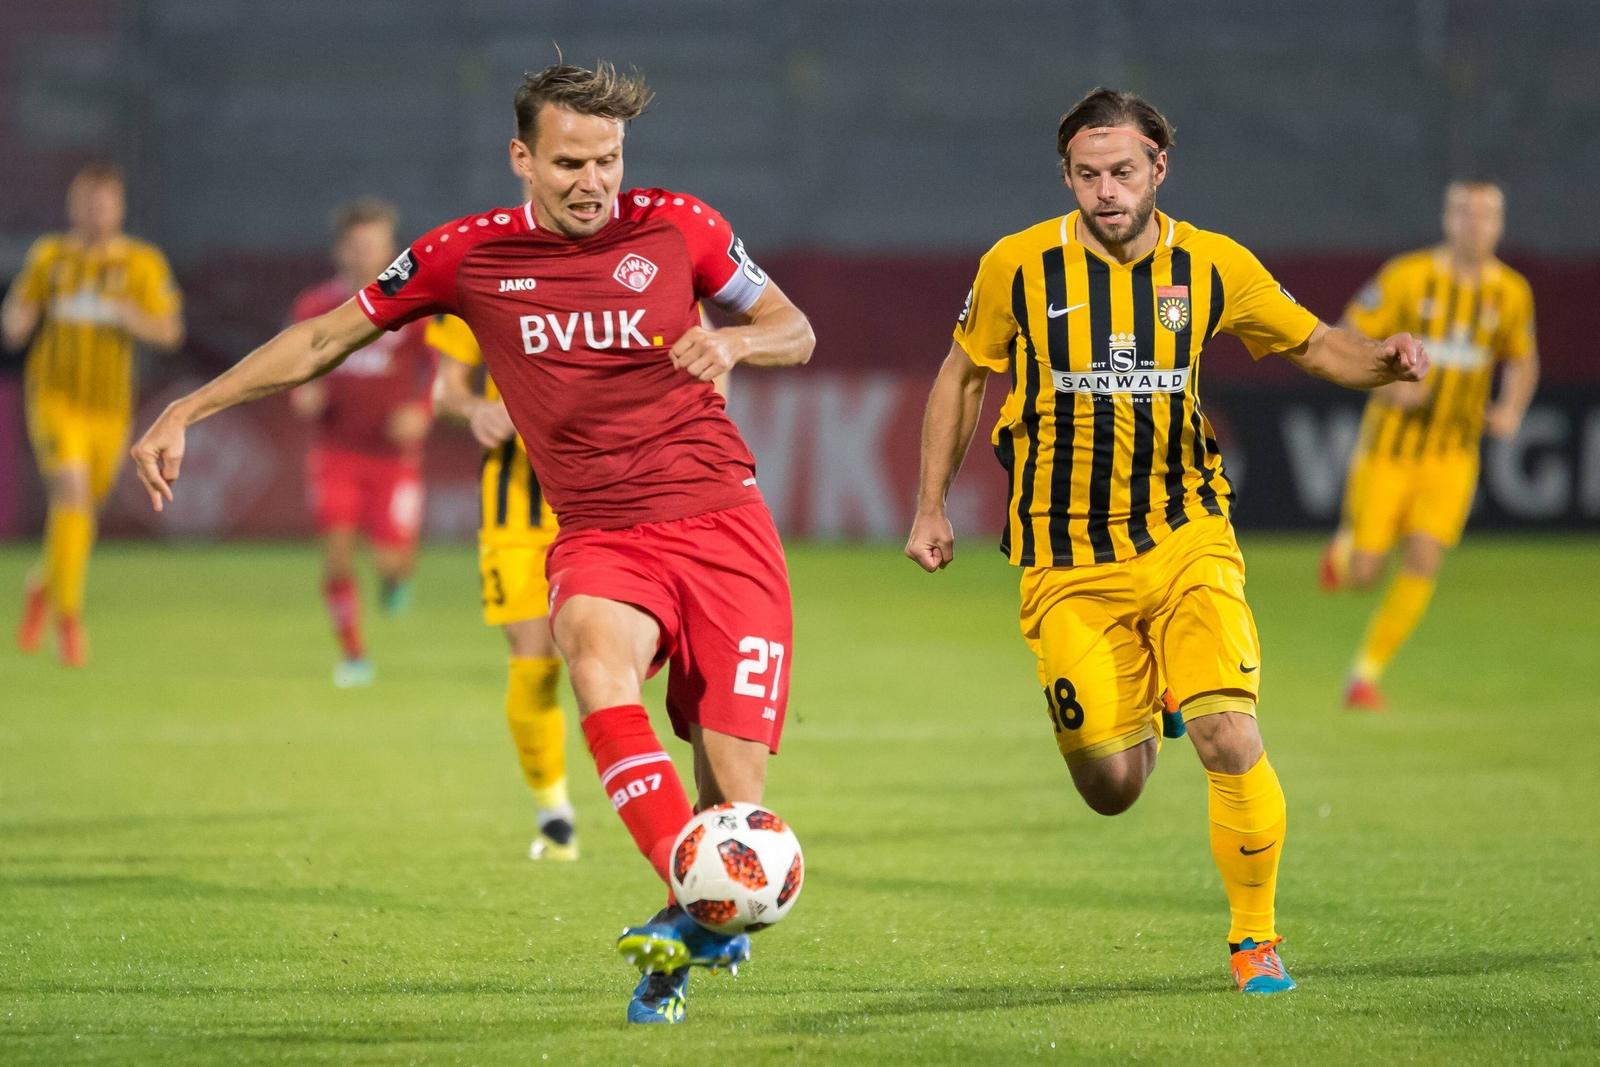 Sebastian Schuppan wechselte von Dynamo Dresden an den Dallenberg.